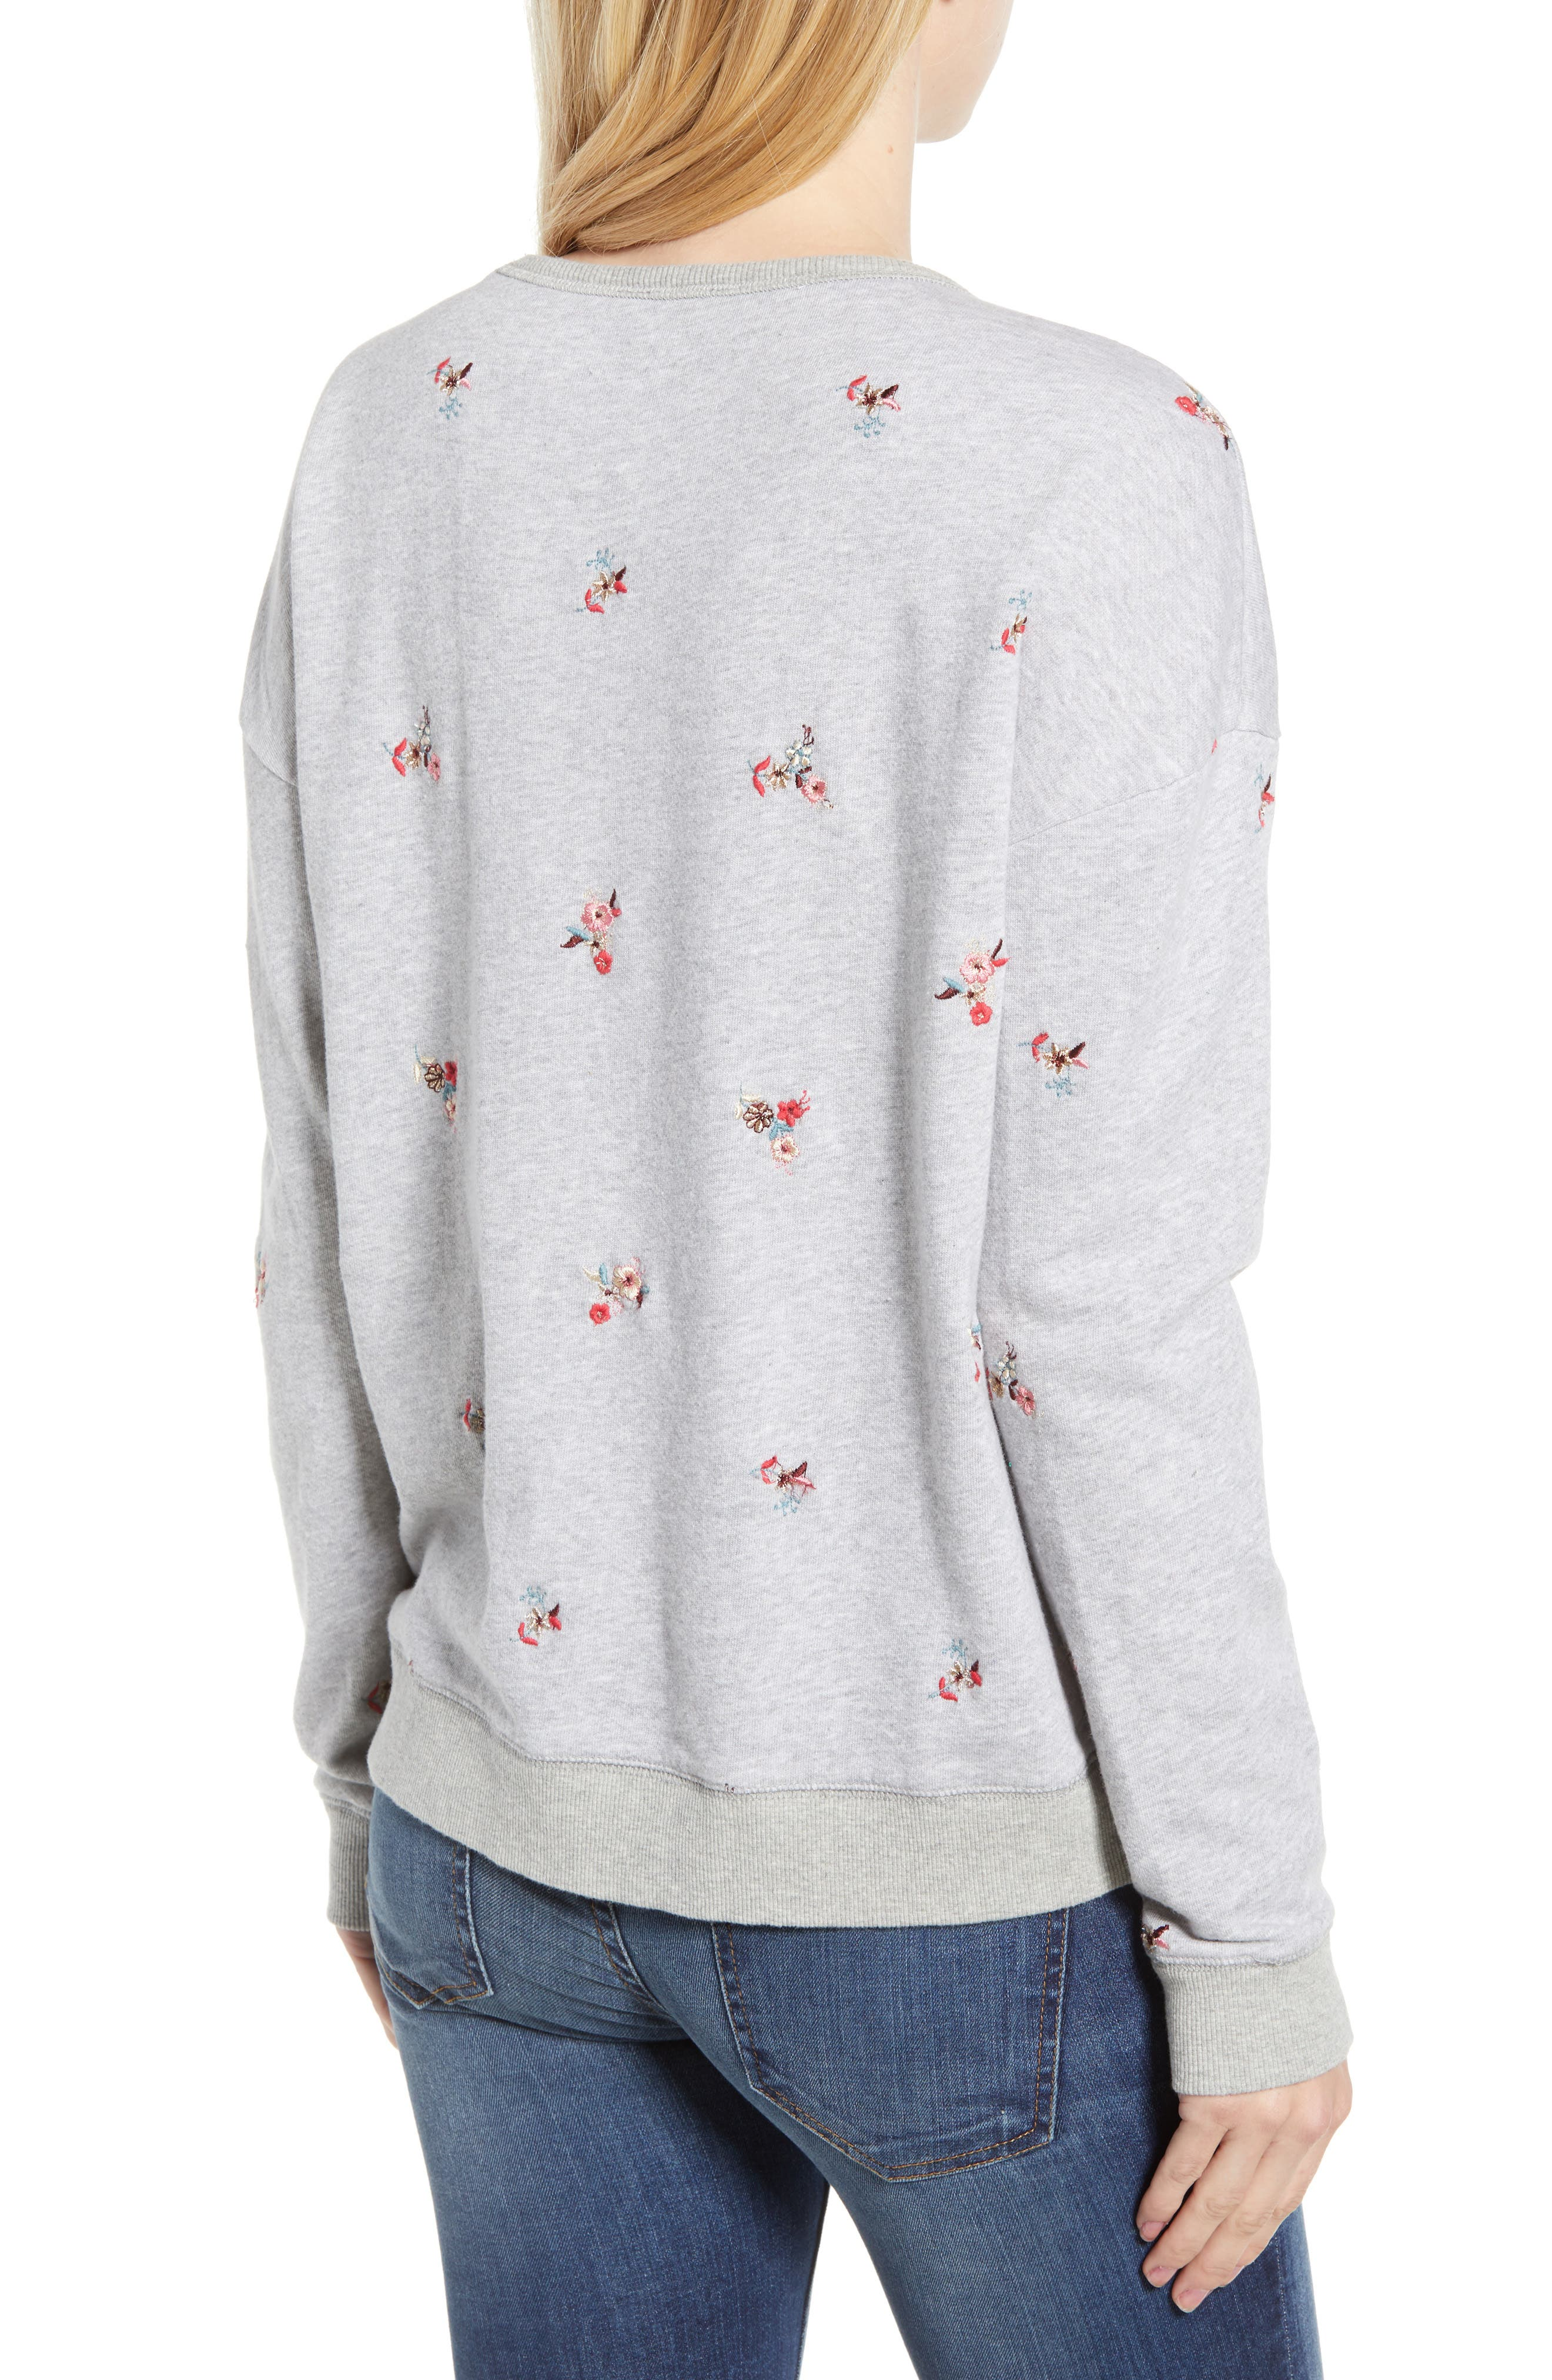 Embroidered Flowers Sweatshirt,                             Alternate thumbnail 2, color,                             030